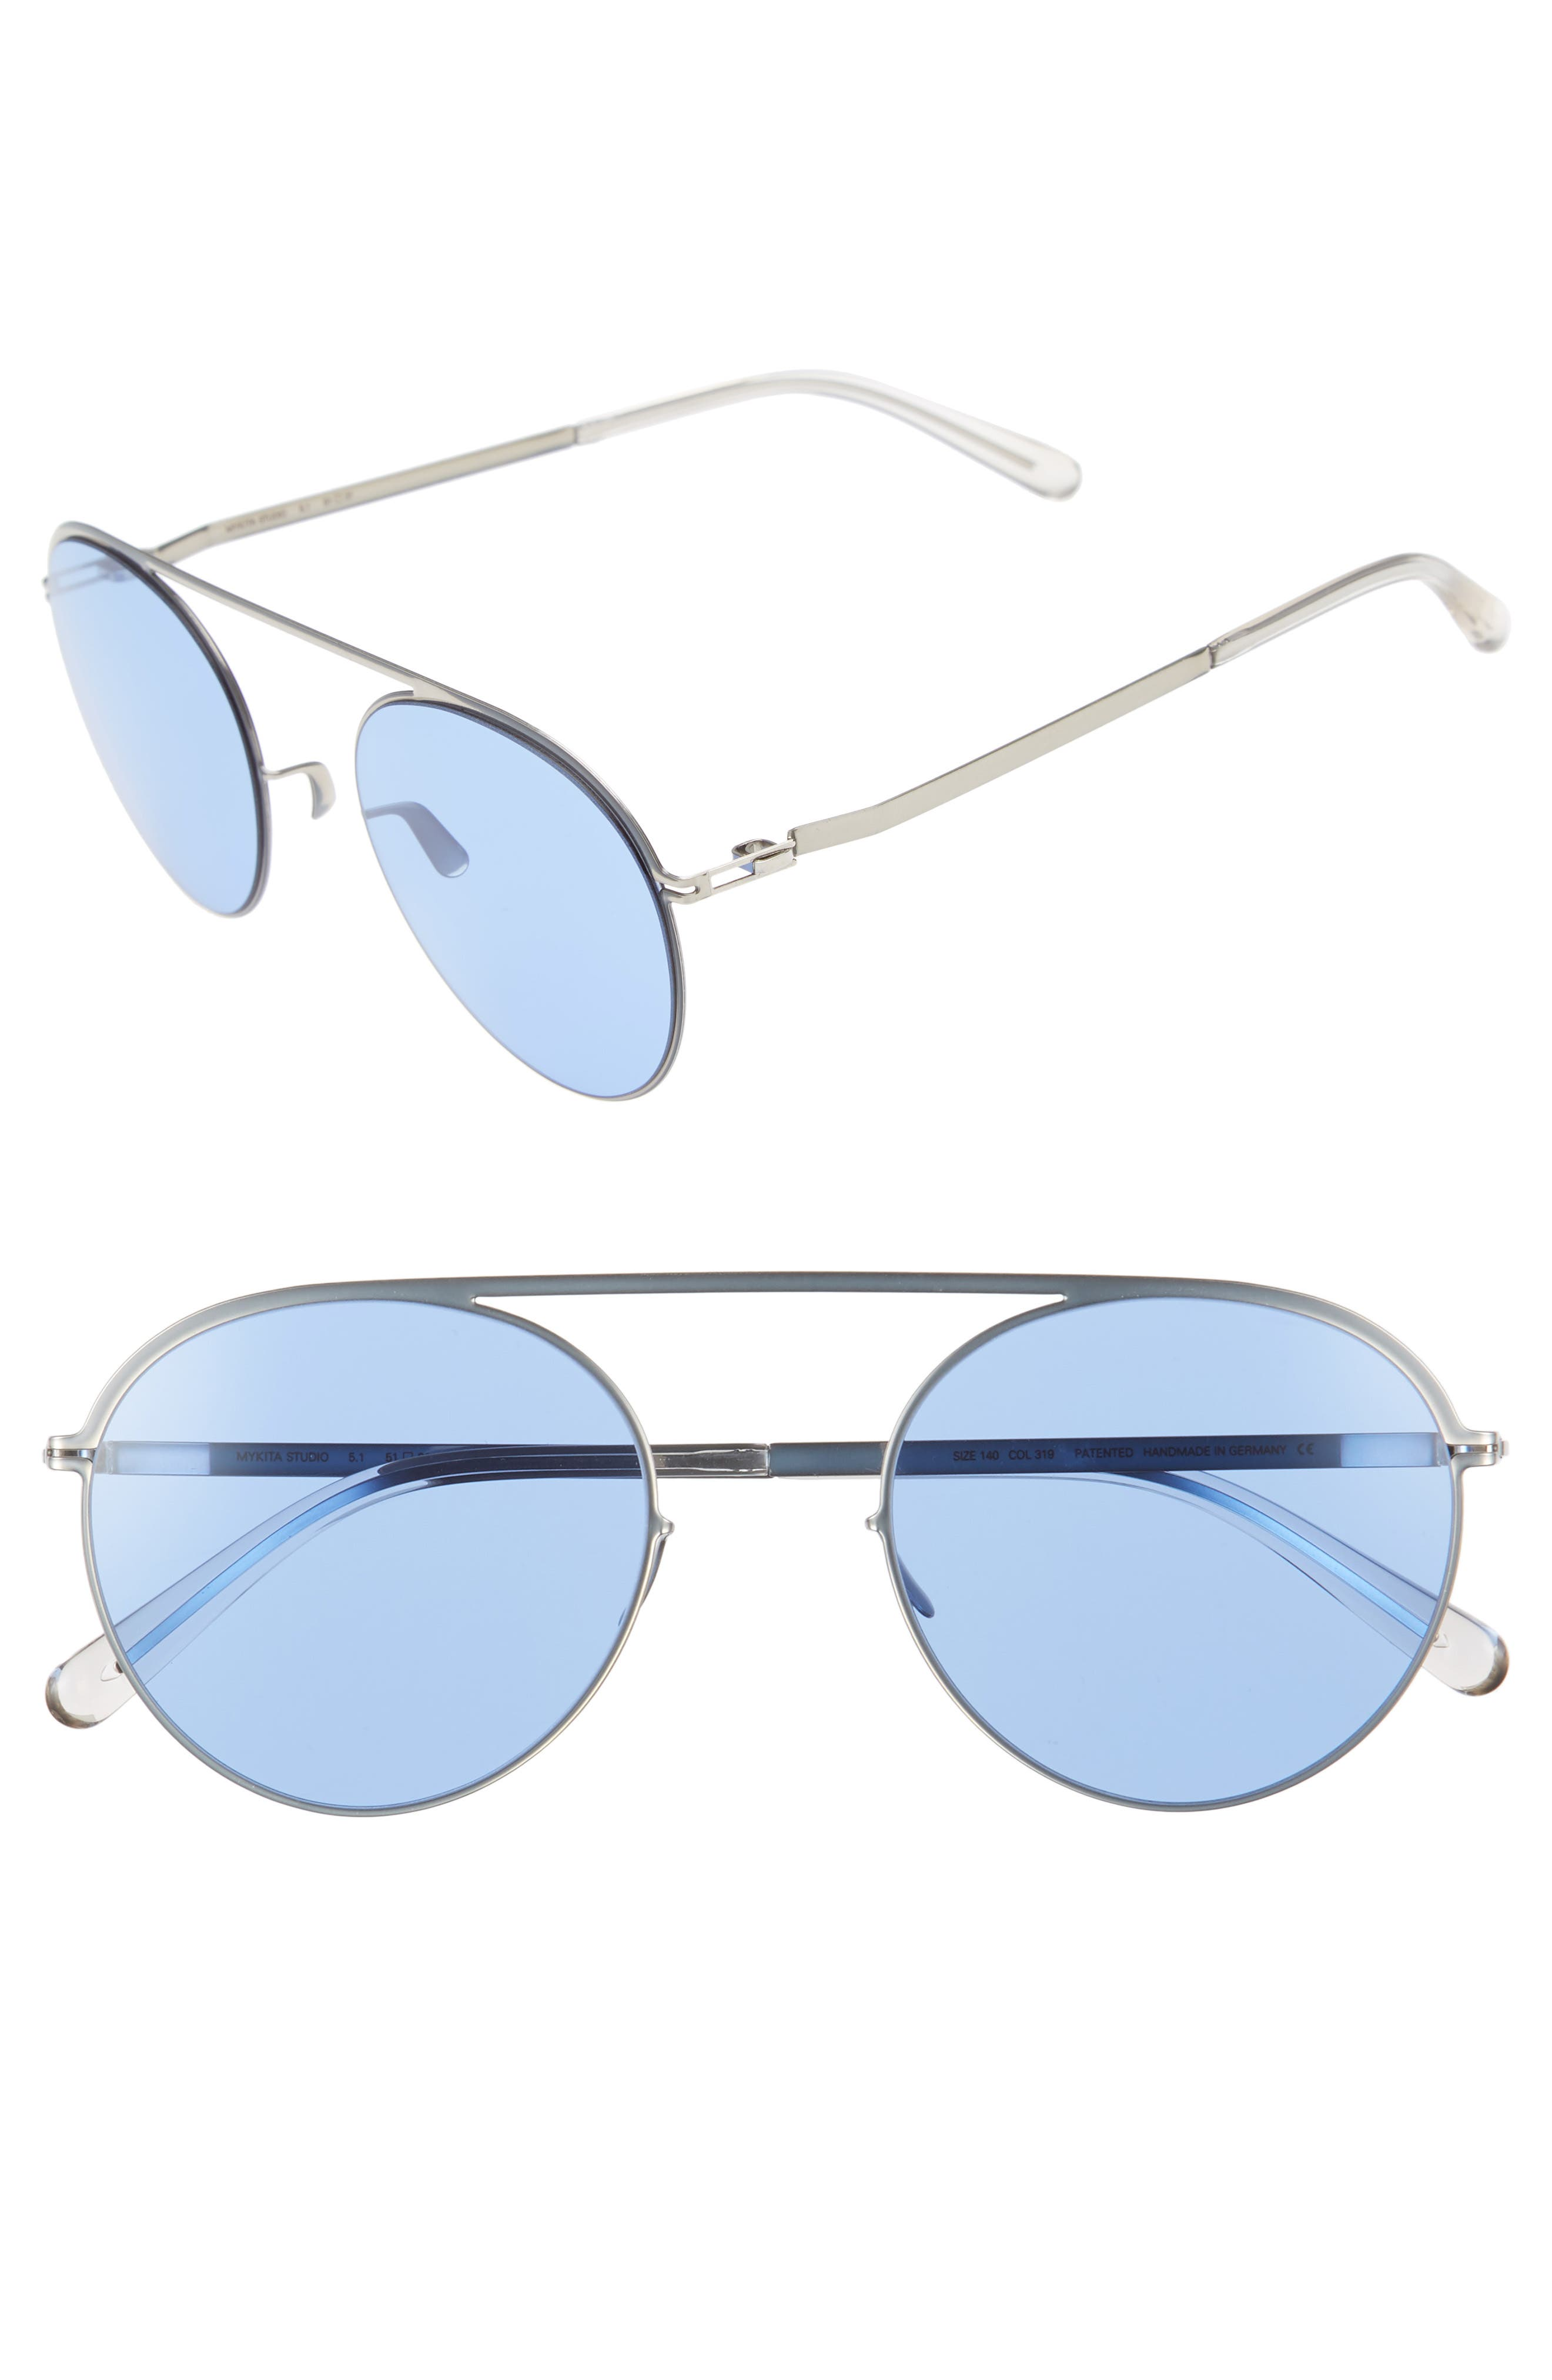 Studio 5.1 51mm Sunglasses,                             Main thumbnail 1, color,                             040